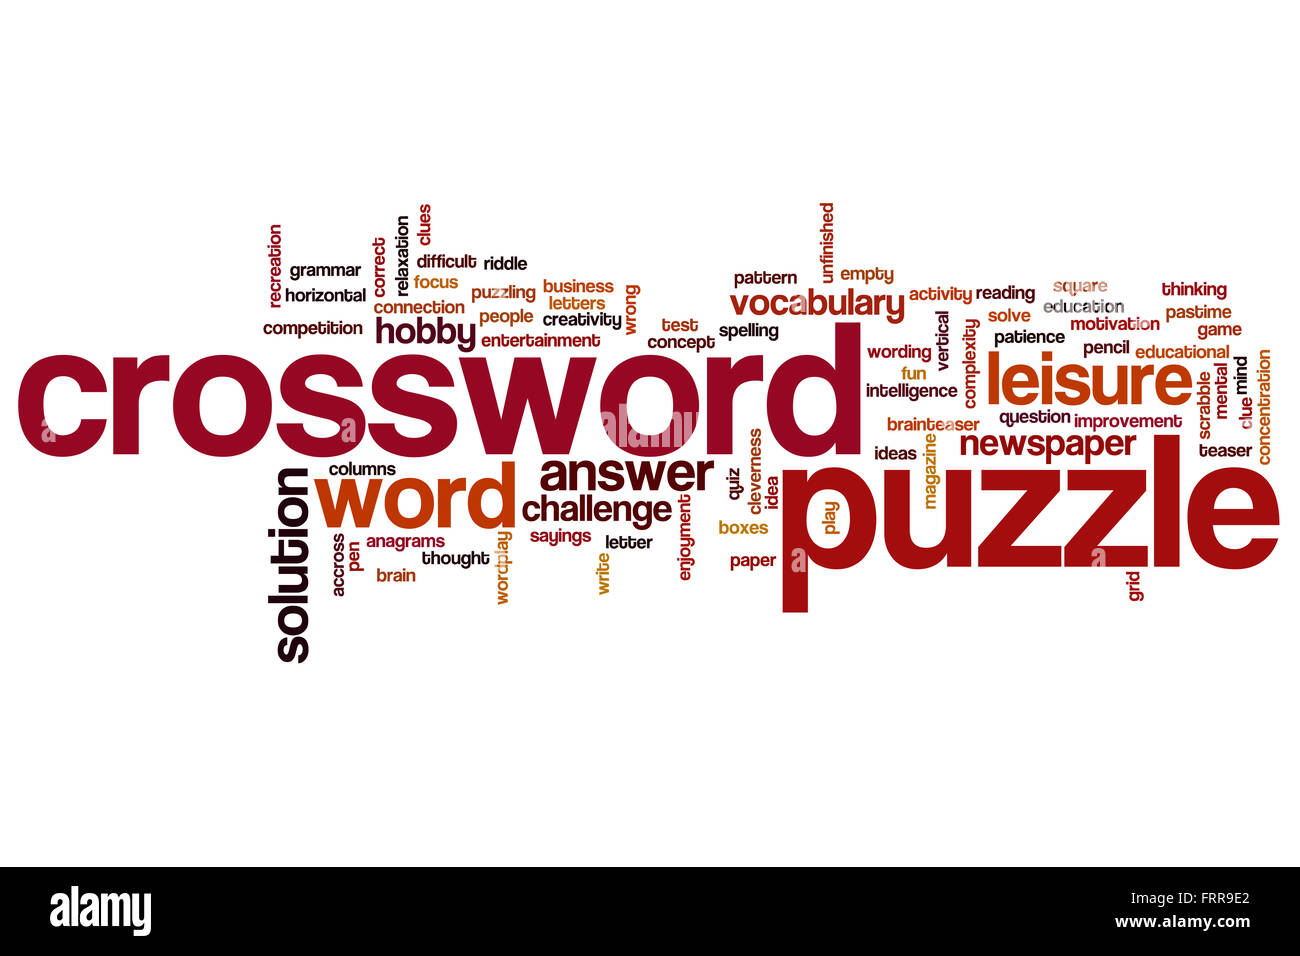 Crossword Puzzle Word Cloud Concept Stock Photo Alamy